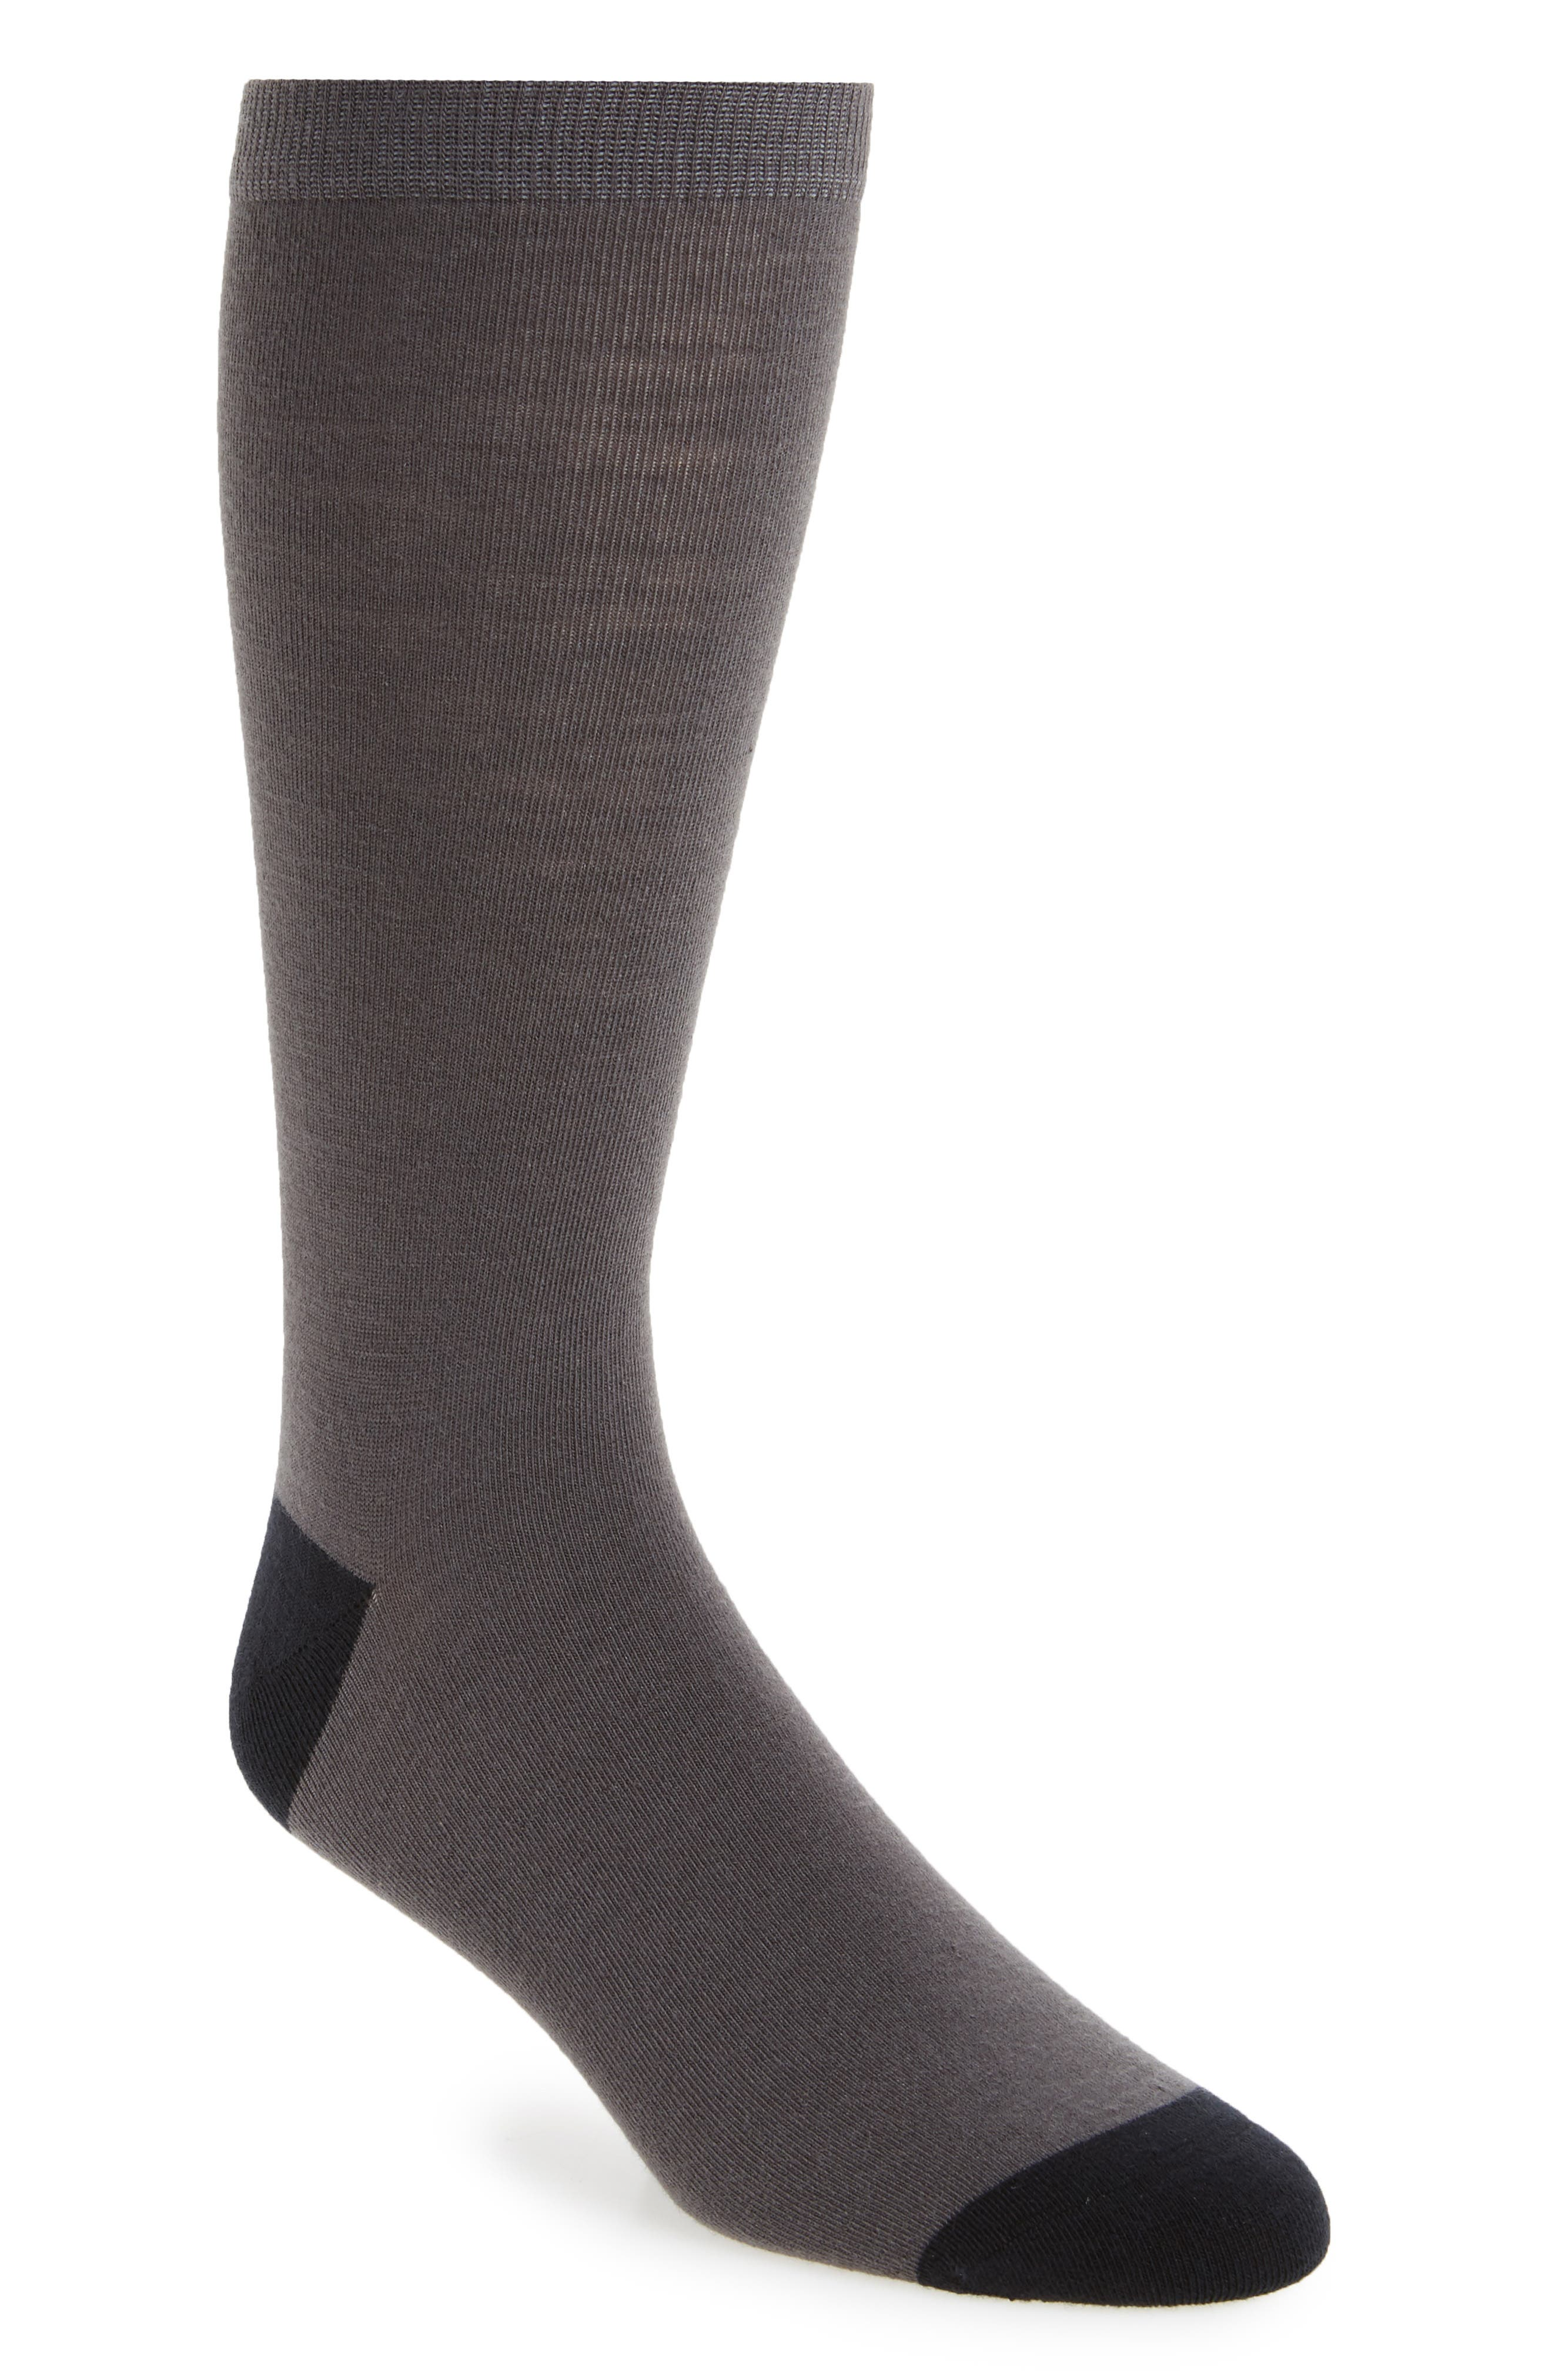 Colorblock Socks,                             Main thumbnail 1, color,                             Charcoal